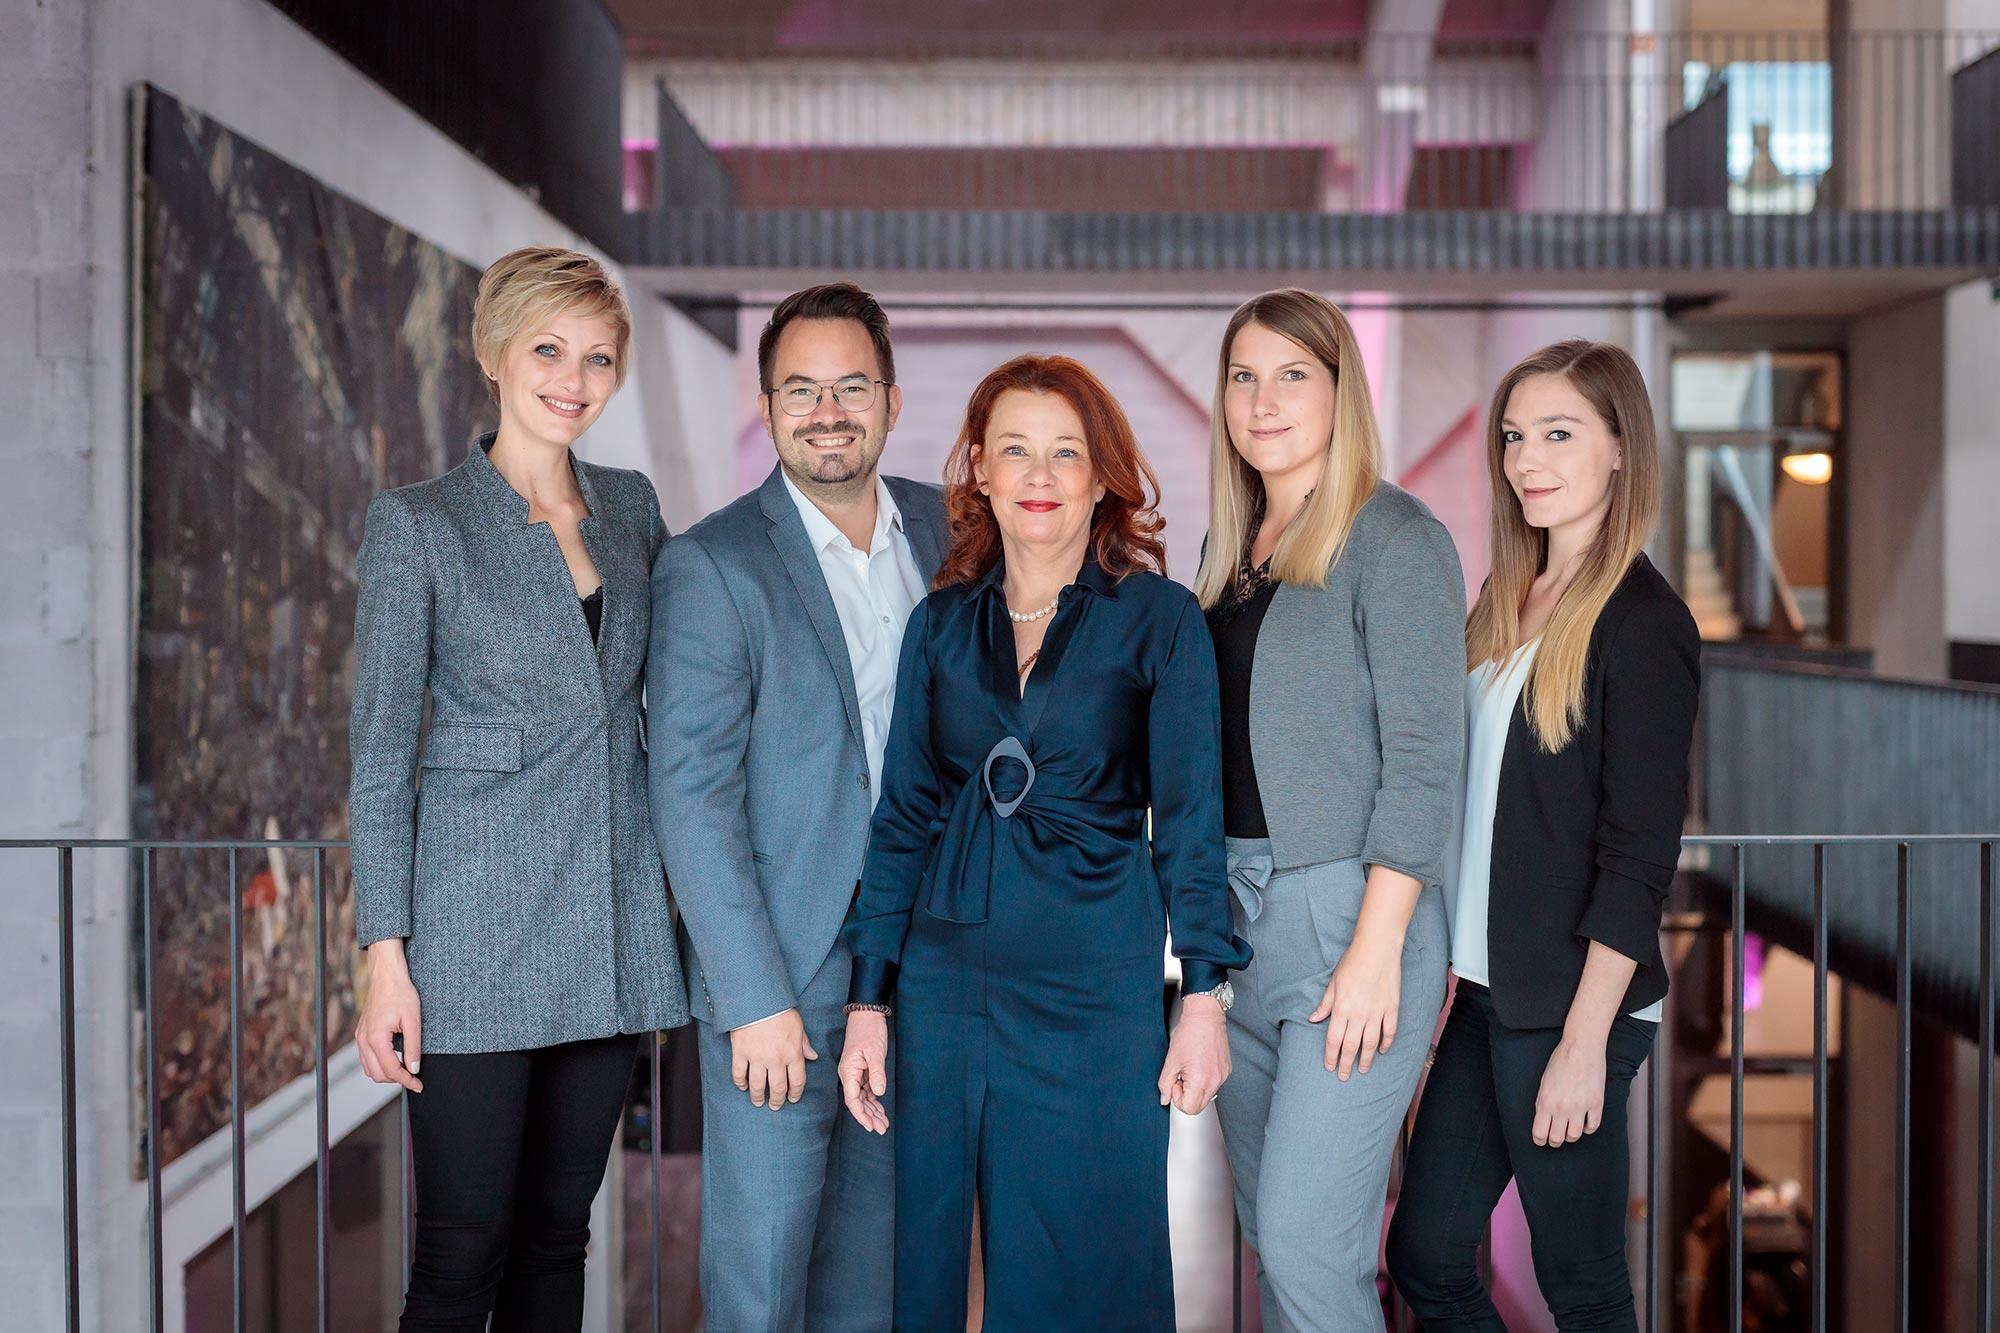 Iventa Salzburg / Teamfoto / Businessportrait, Fotograf Salzburg, Christian Streili Photography